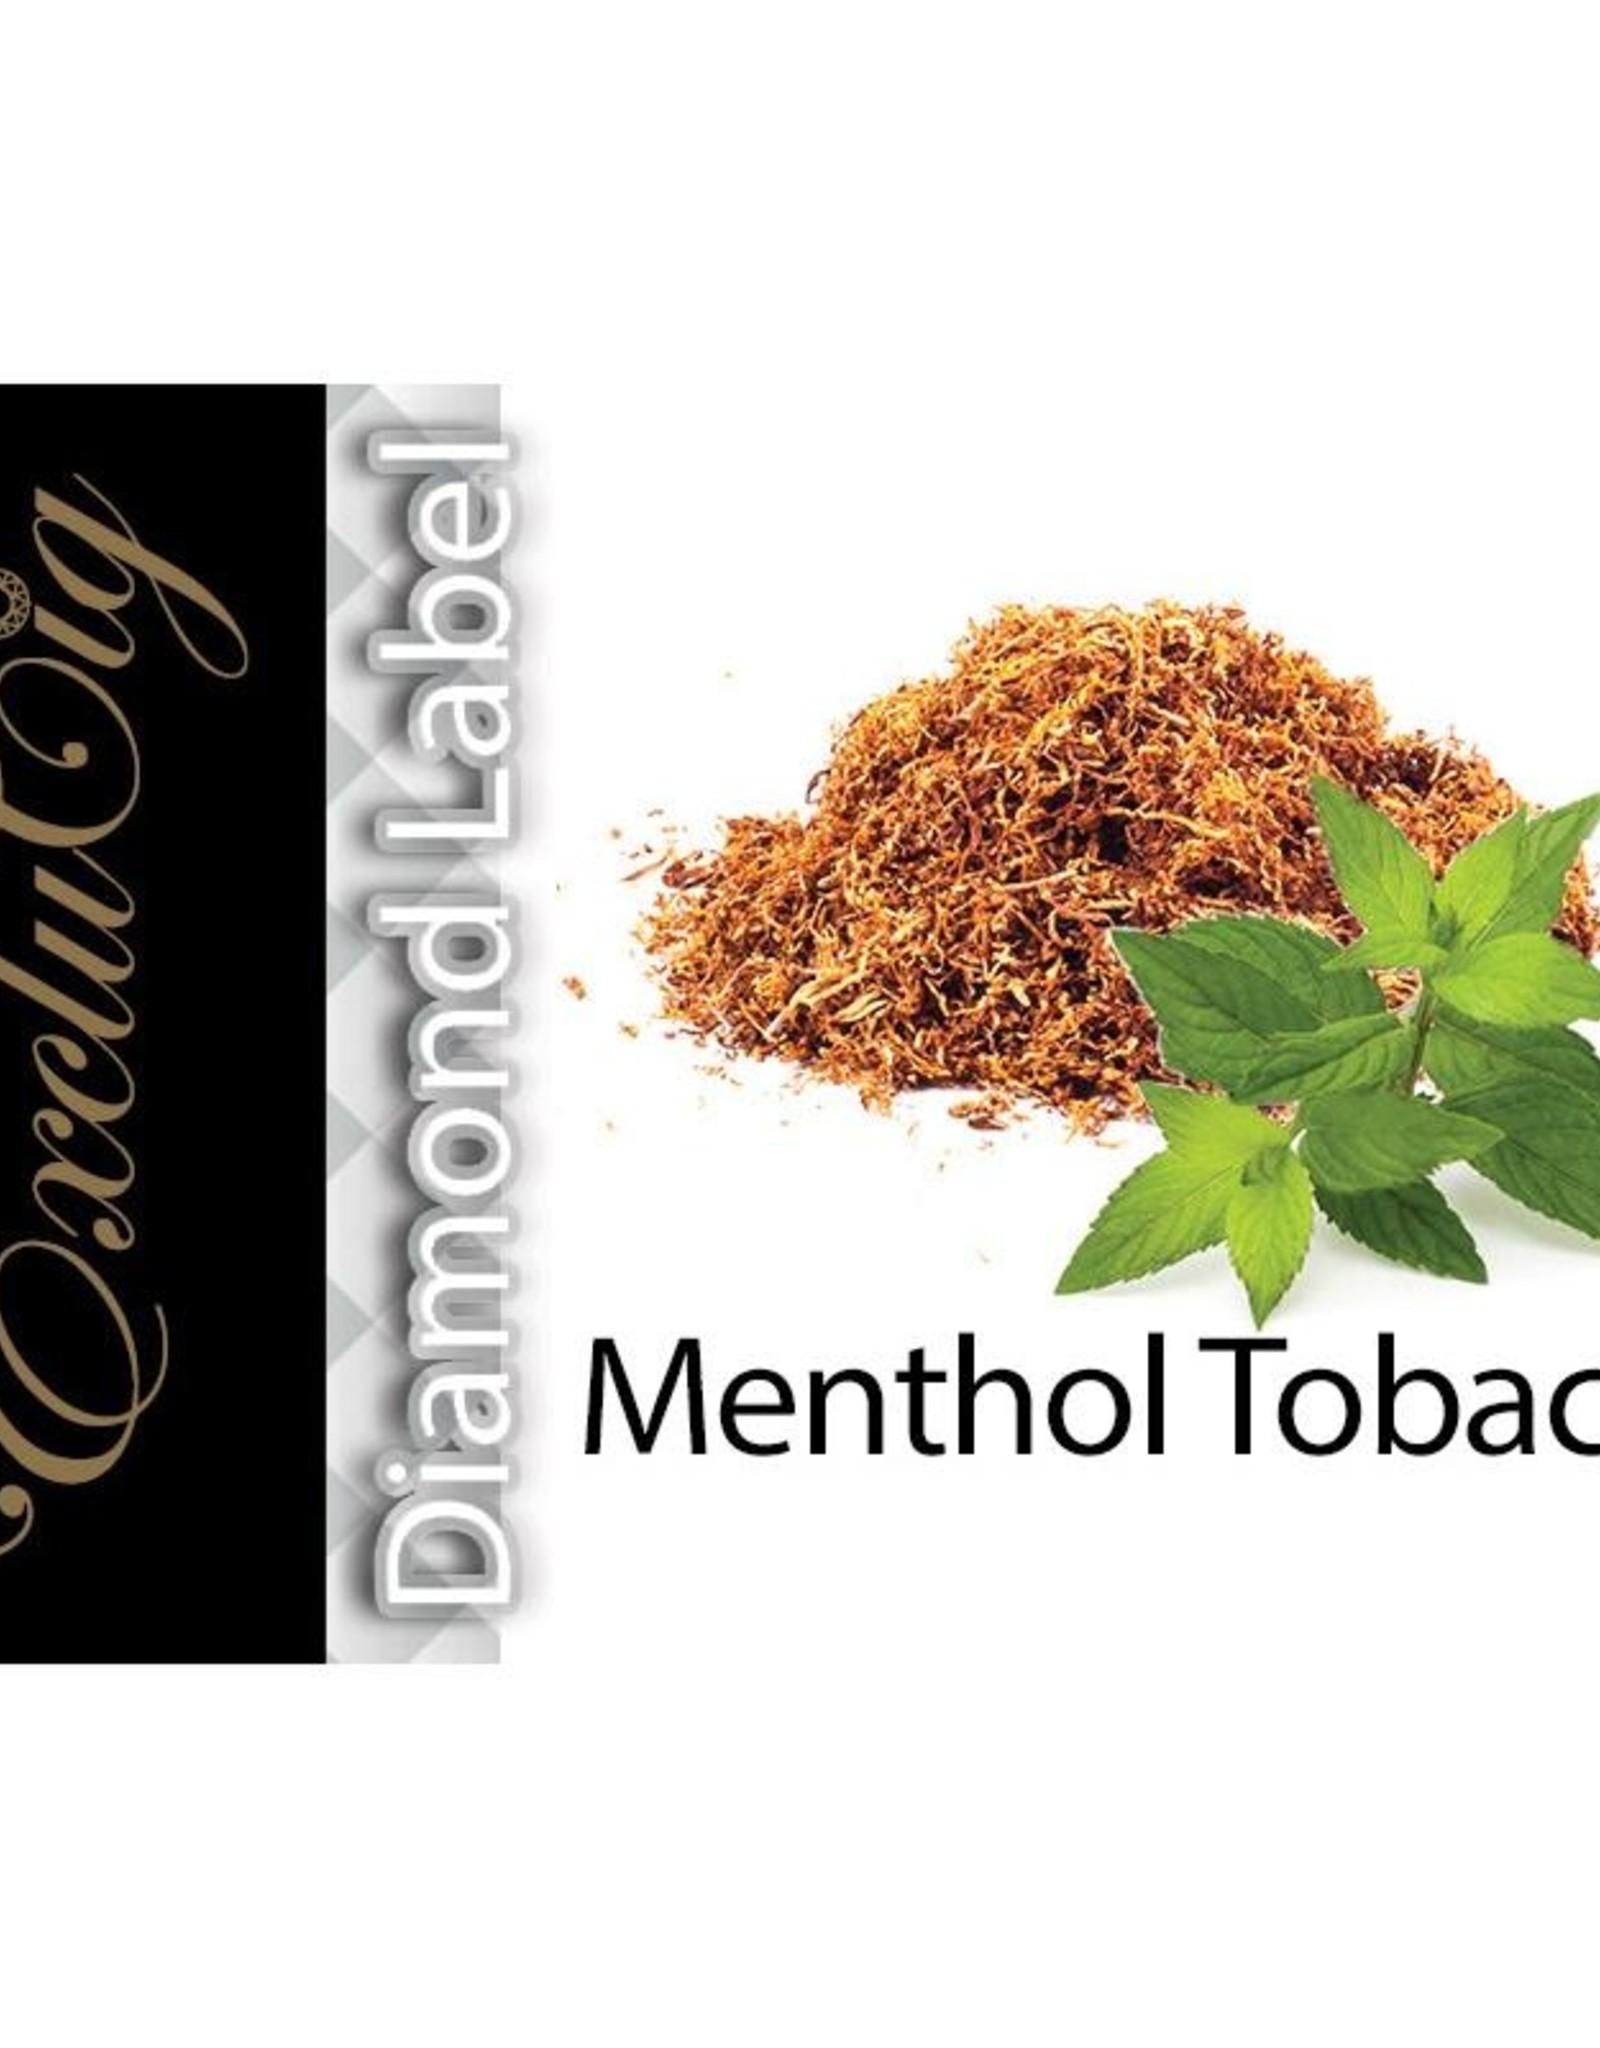 Exclucig Exclucig Diamond Label E-liquid Menthol Tobacco 6 mg Nicotine